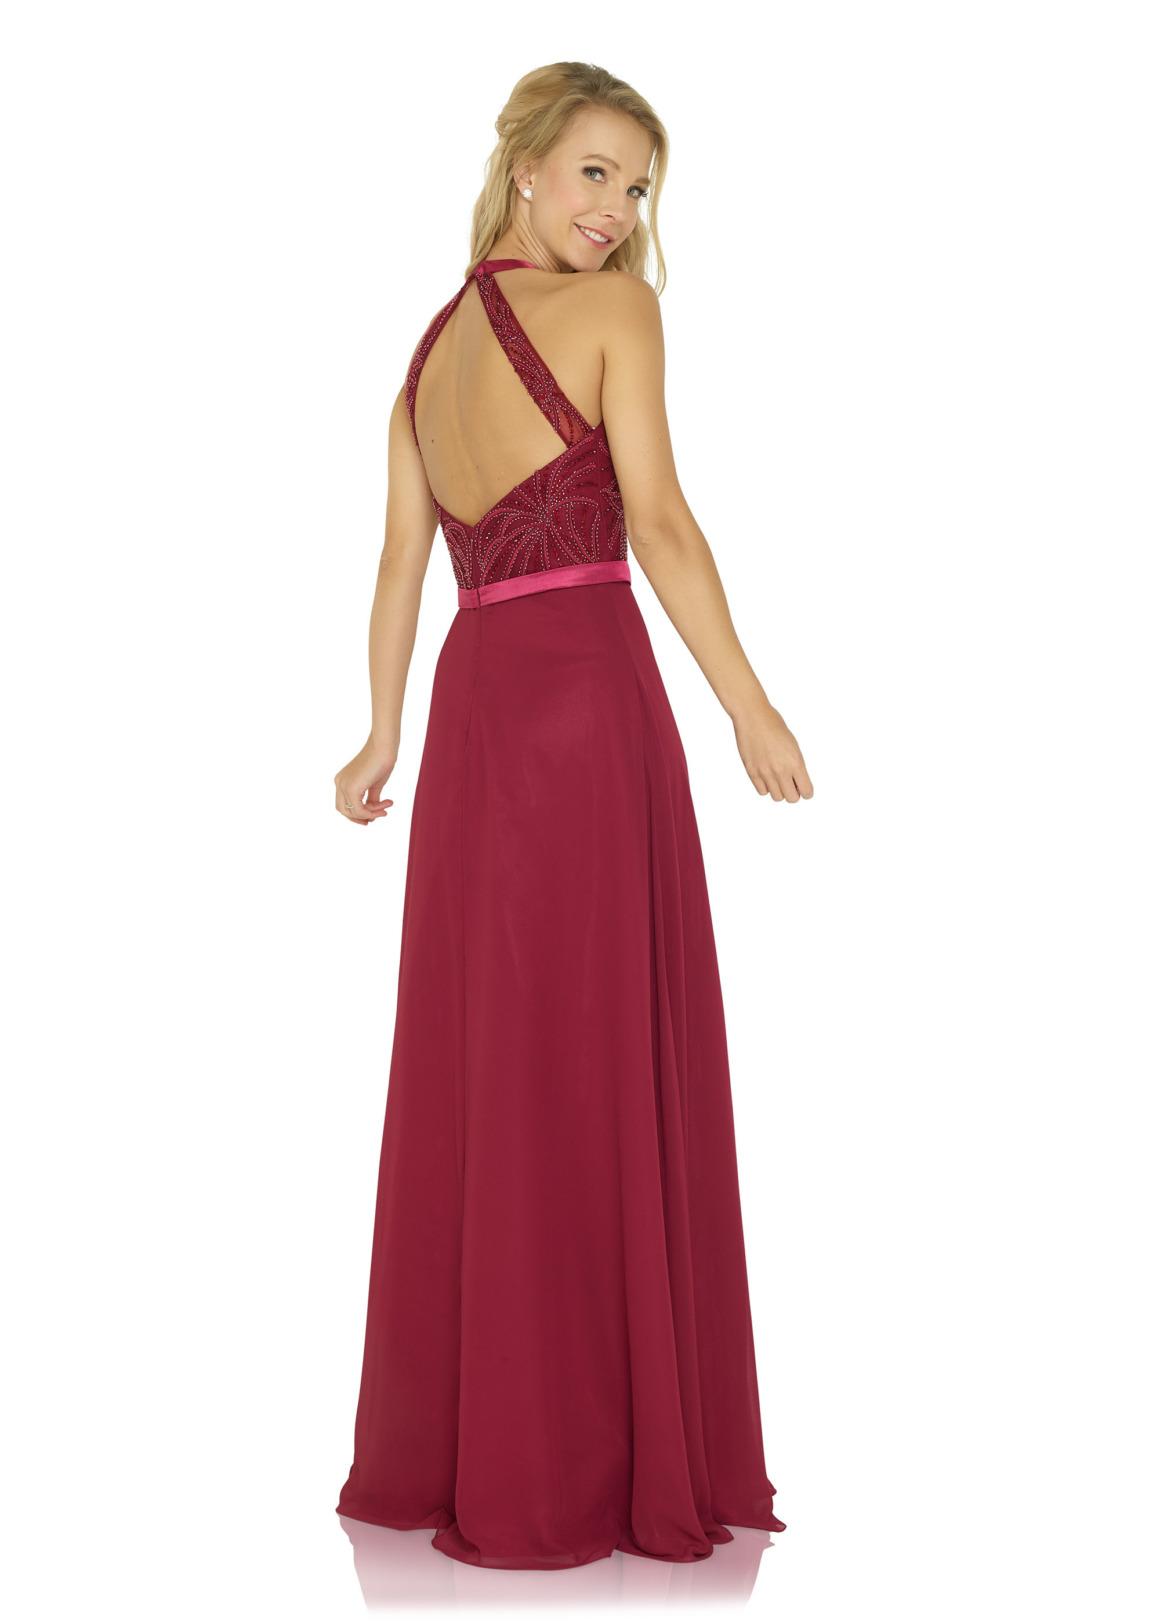 Schützenfest Abiball Hofdamen Hofstaat langes Kleid Oberteil mit Strass rot bordeaux Chiffon Rock Rückenansicht